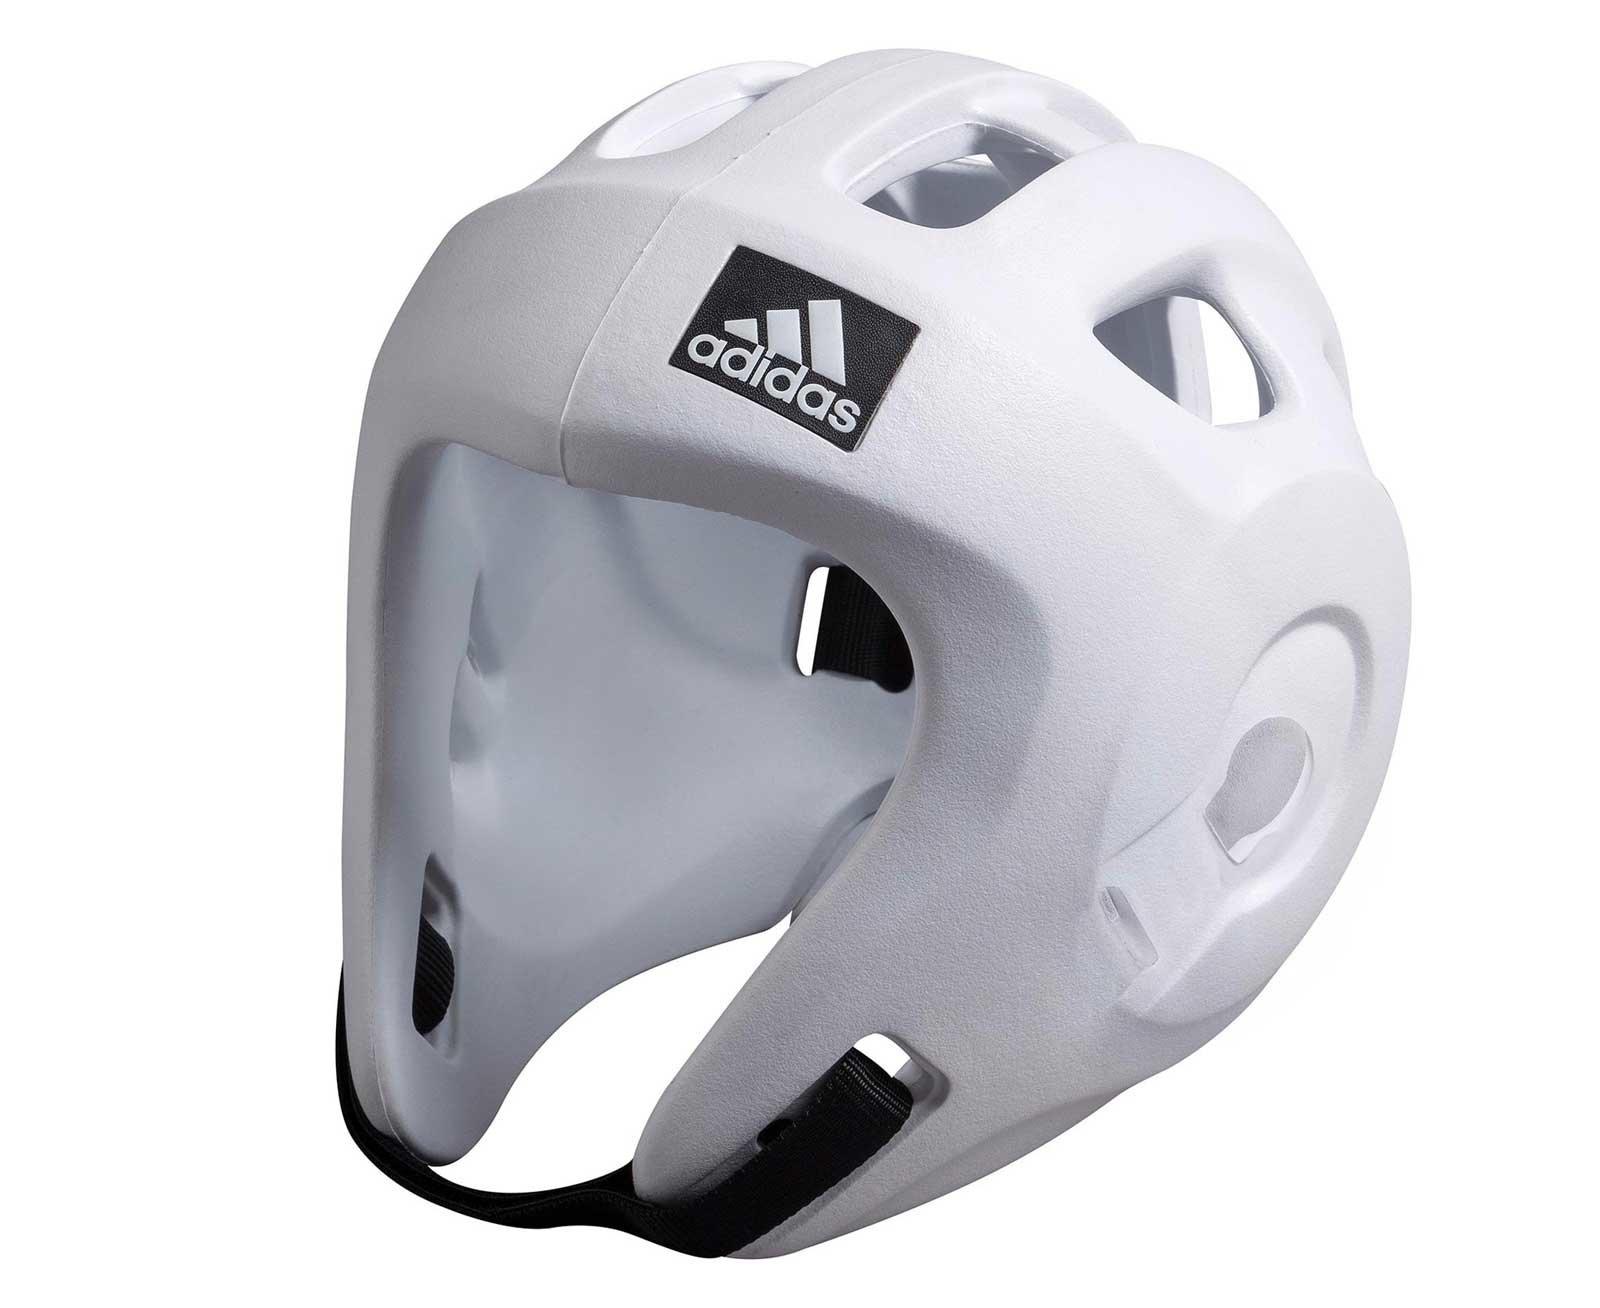 Шлем для единоборств Adizero (одобрен WAKO и WTF) белый (размер XS)